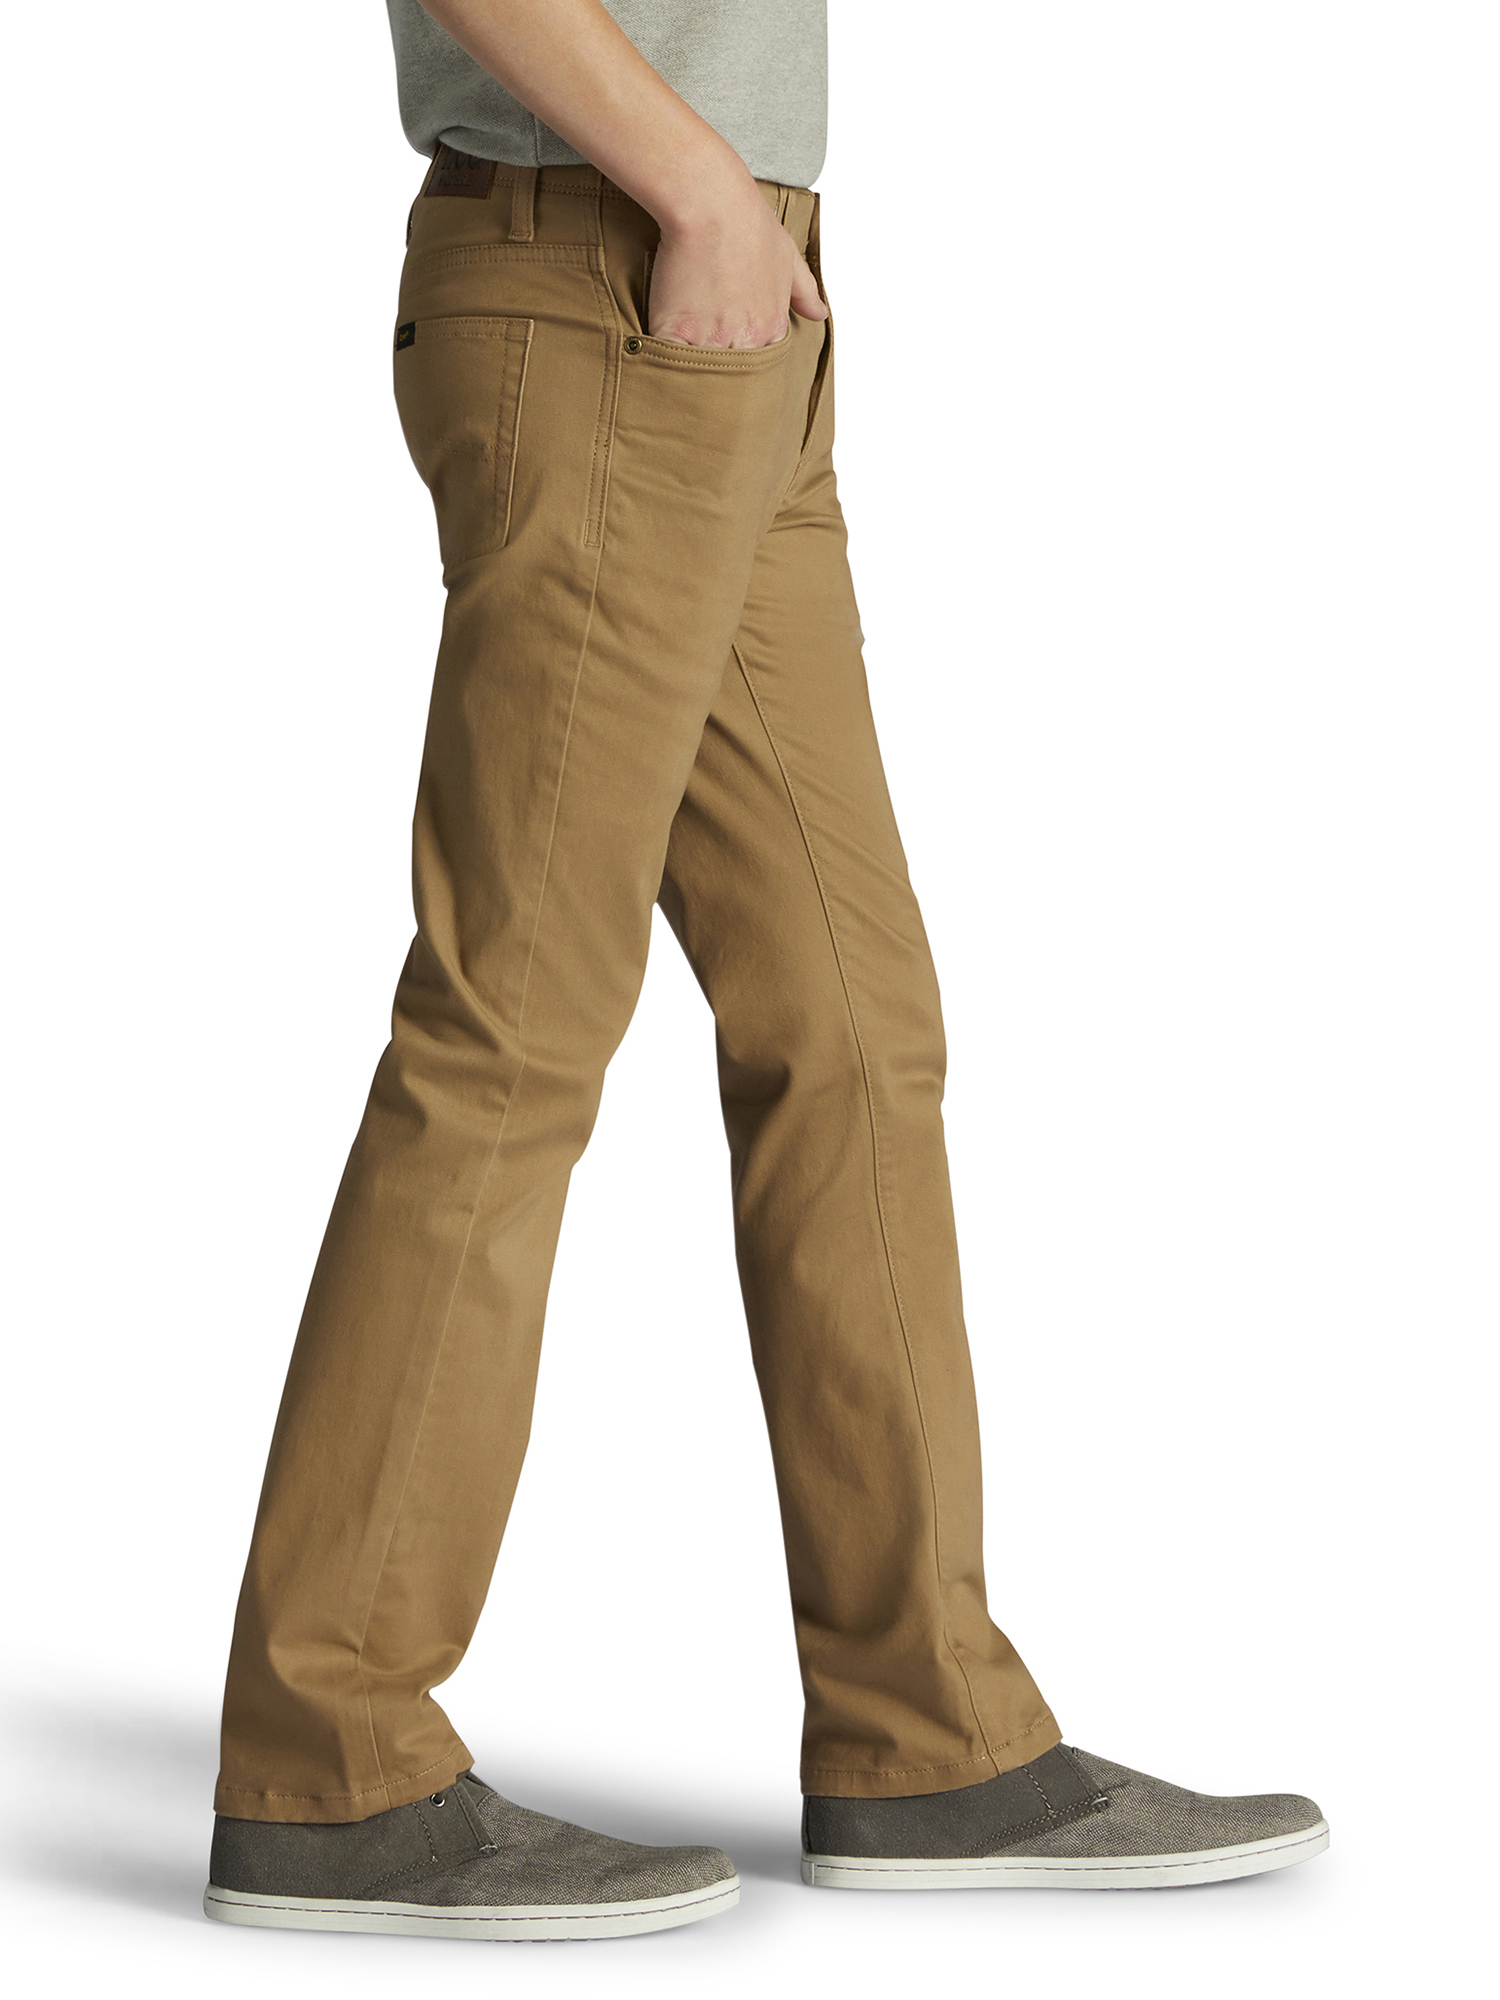 Lee Uniforms Boys Performance Series Extreme Comfort Slim Fit Jean